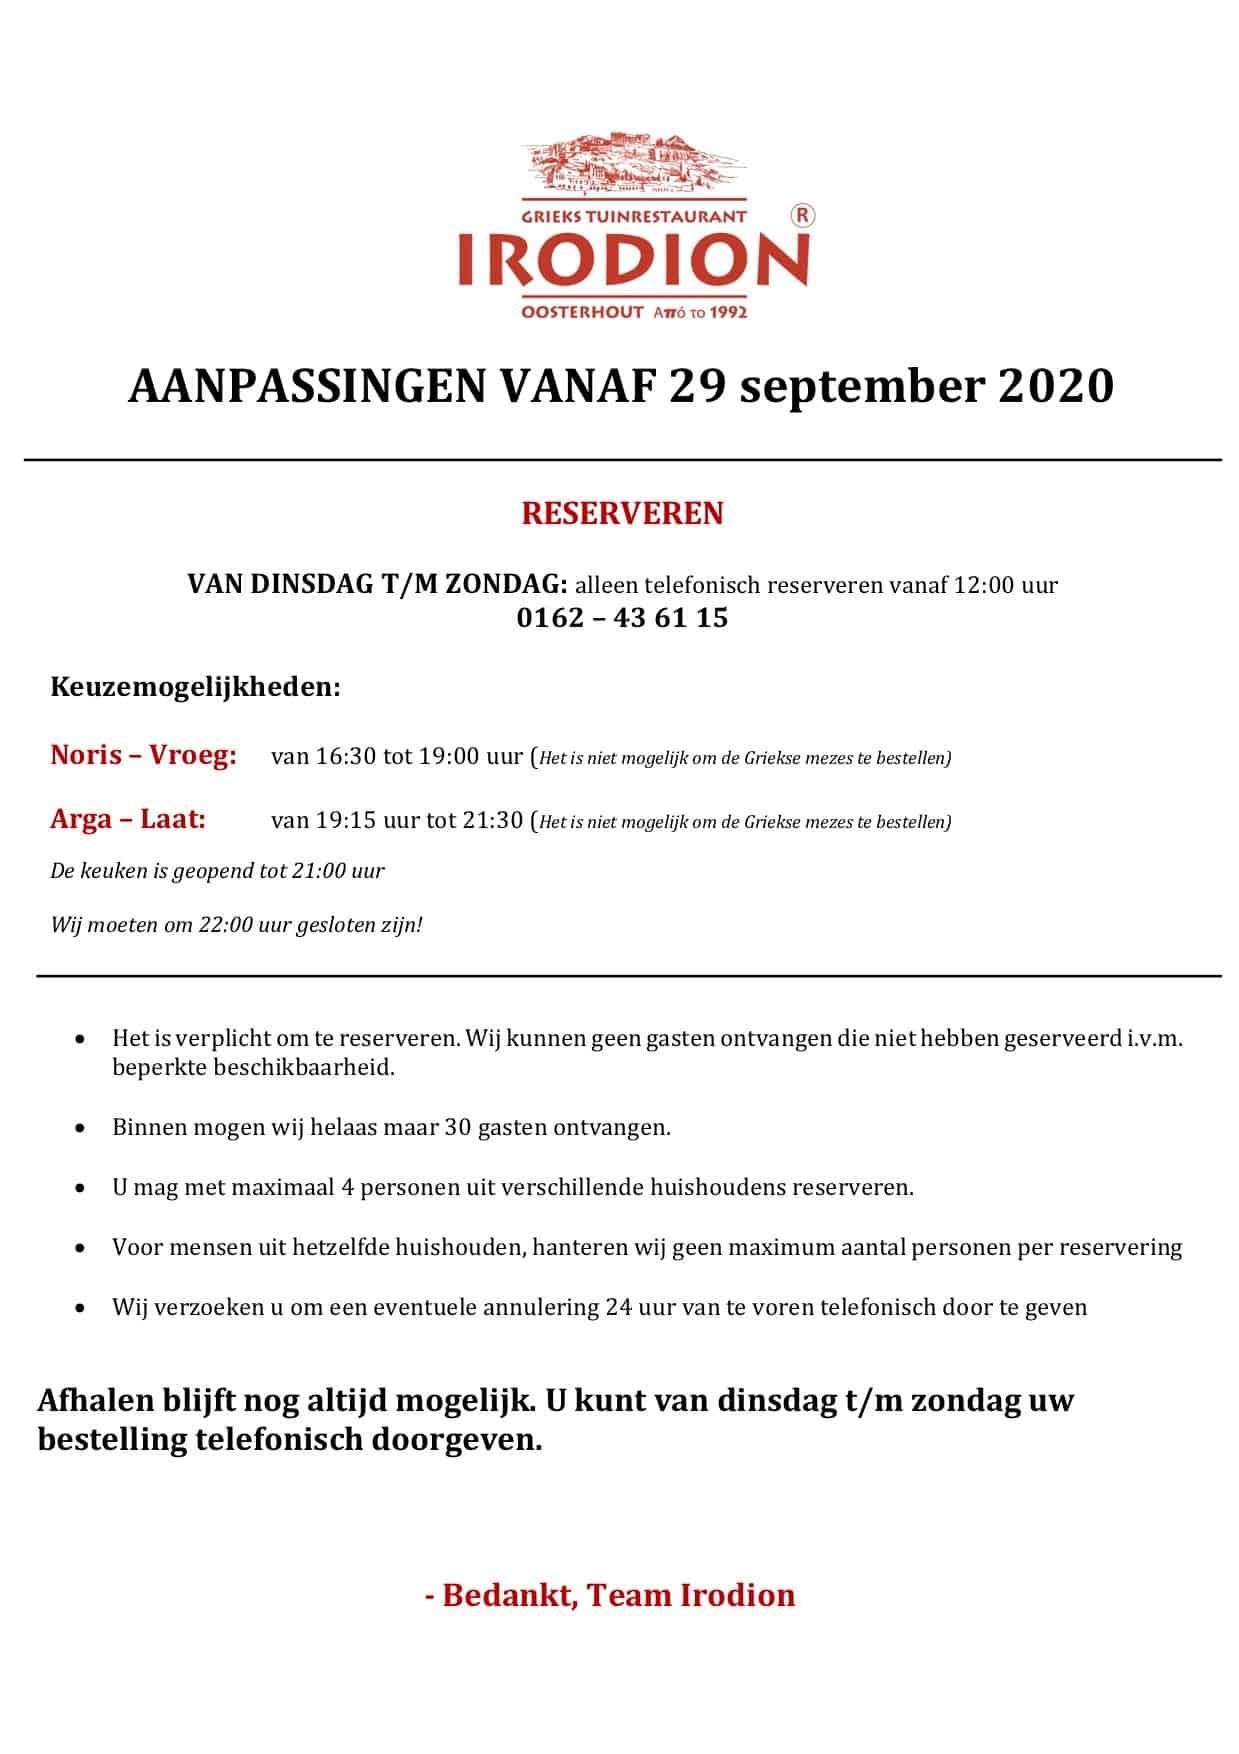 Reserveren bij Restaurant Irodion na 26 september 2020